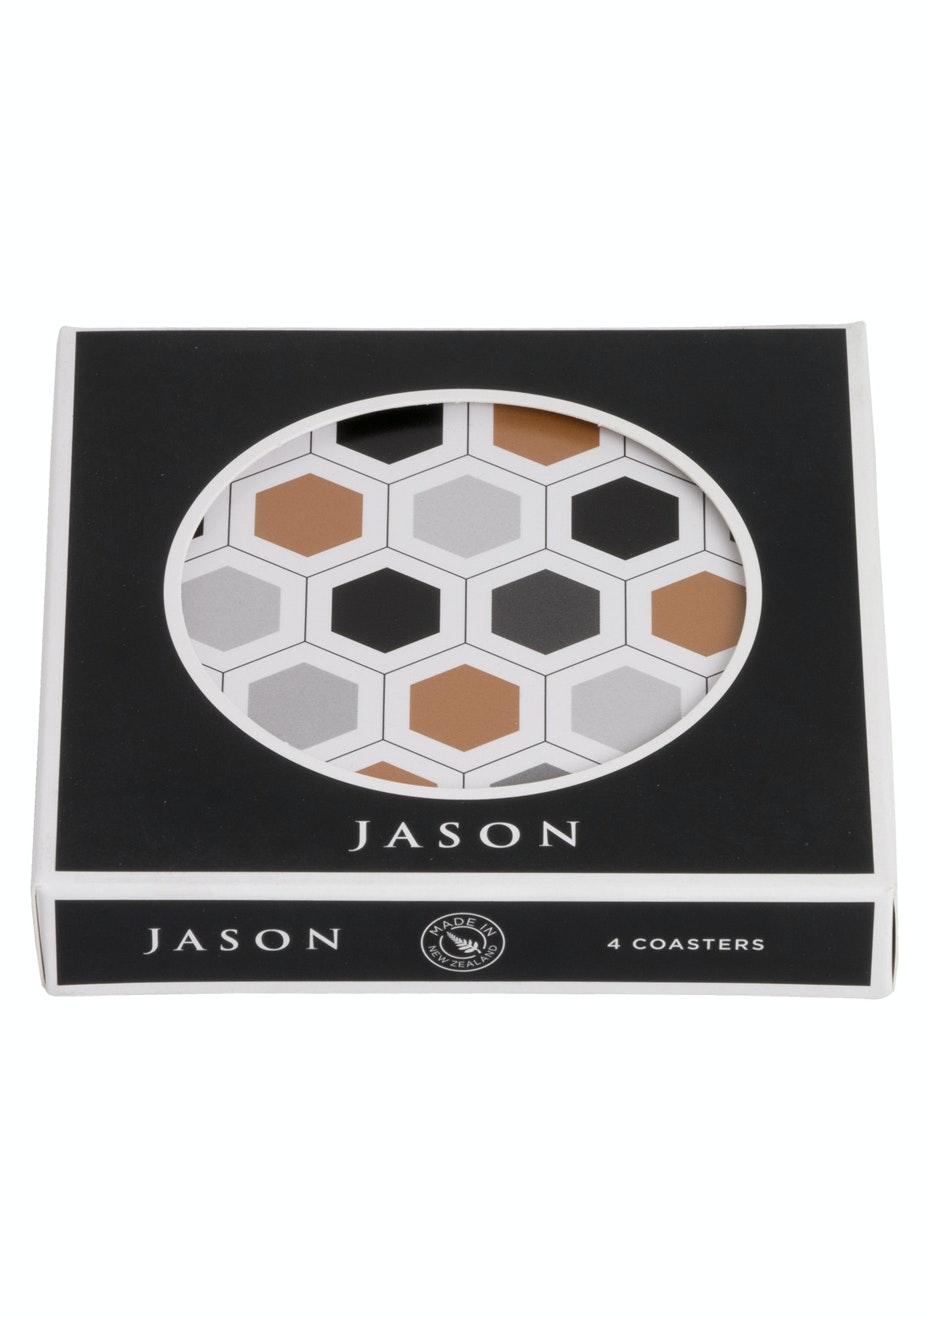 Jason - Hexagonals Coasters - Set of 4